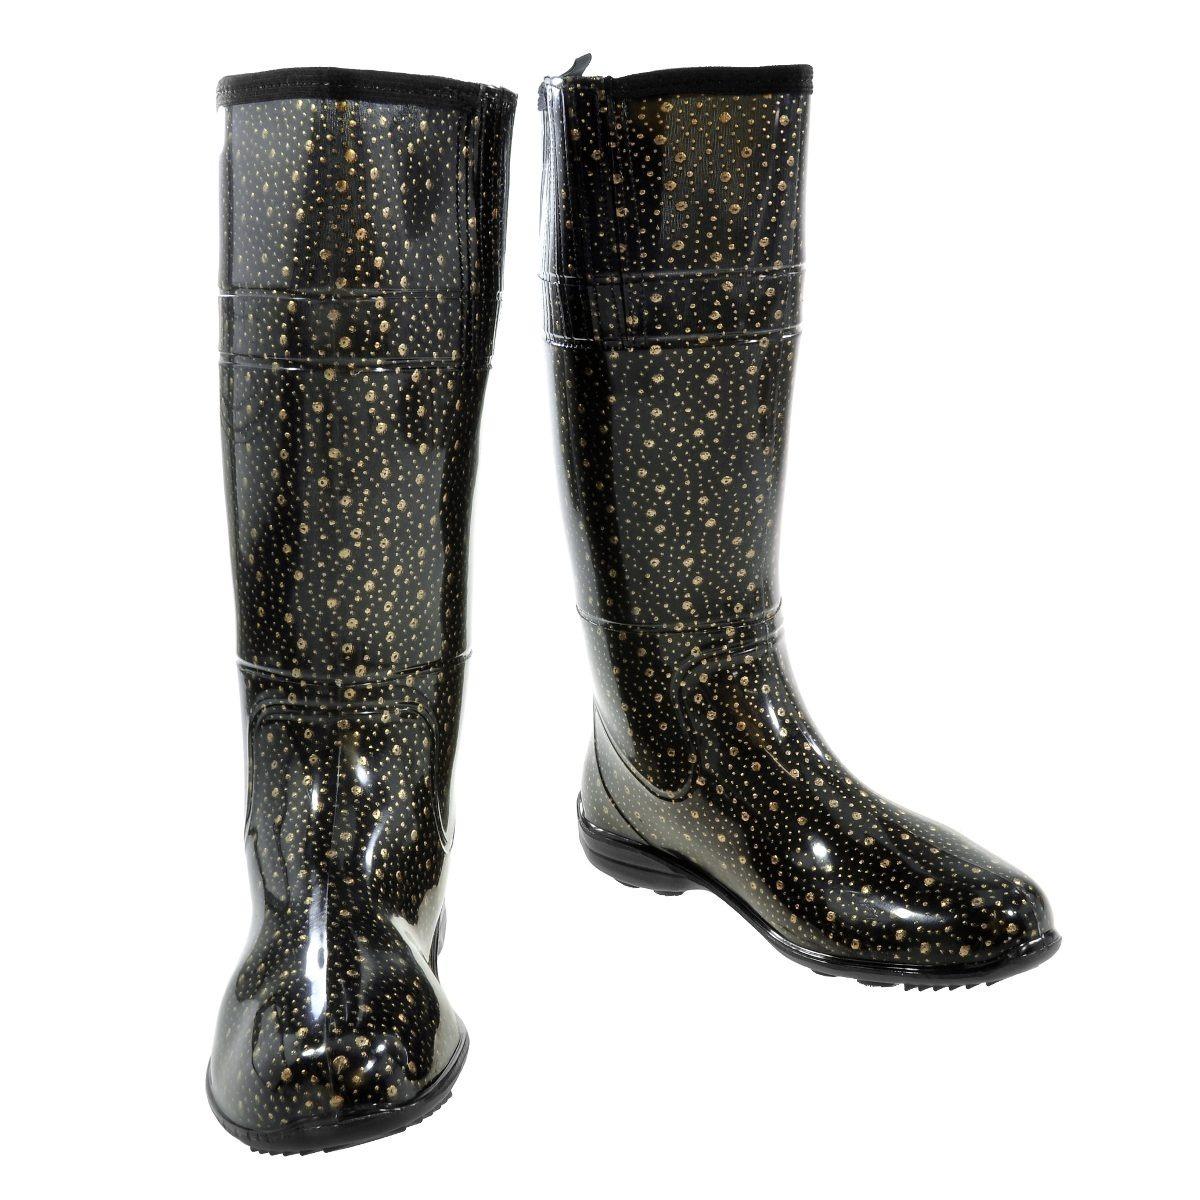 b26112ae1ad bota feminina galocha pat estilo impermeável montaria · bota galocha pat. Carregando  zoom.